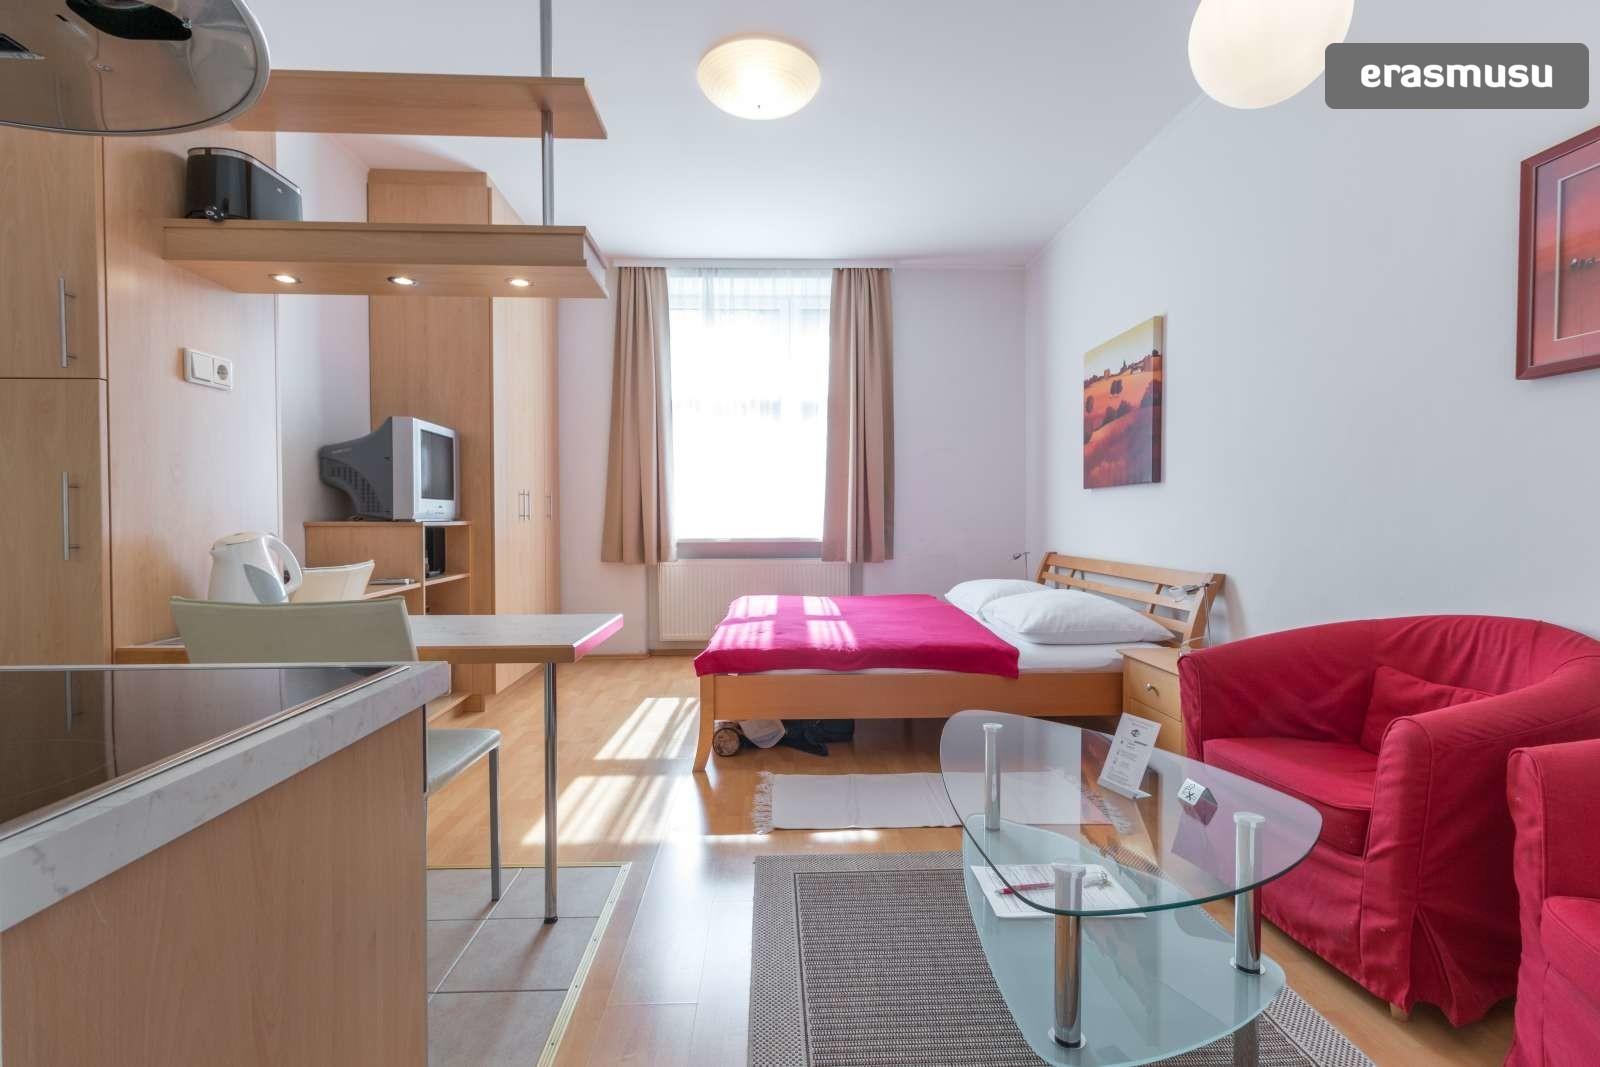 sunny-studio-apartment-rent-near-bohemian-prater-favoriten-b94e0